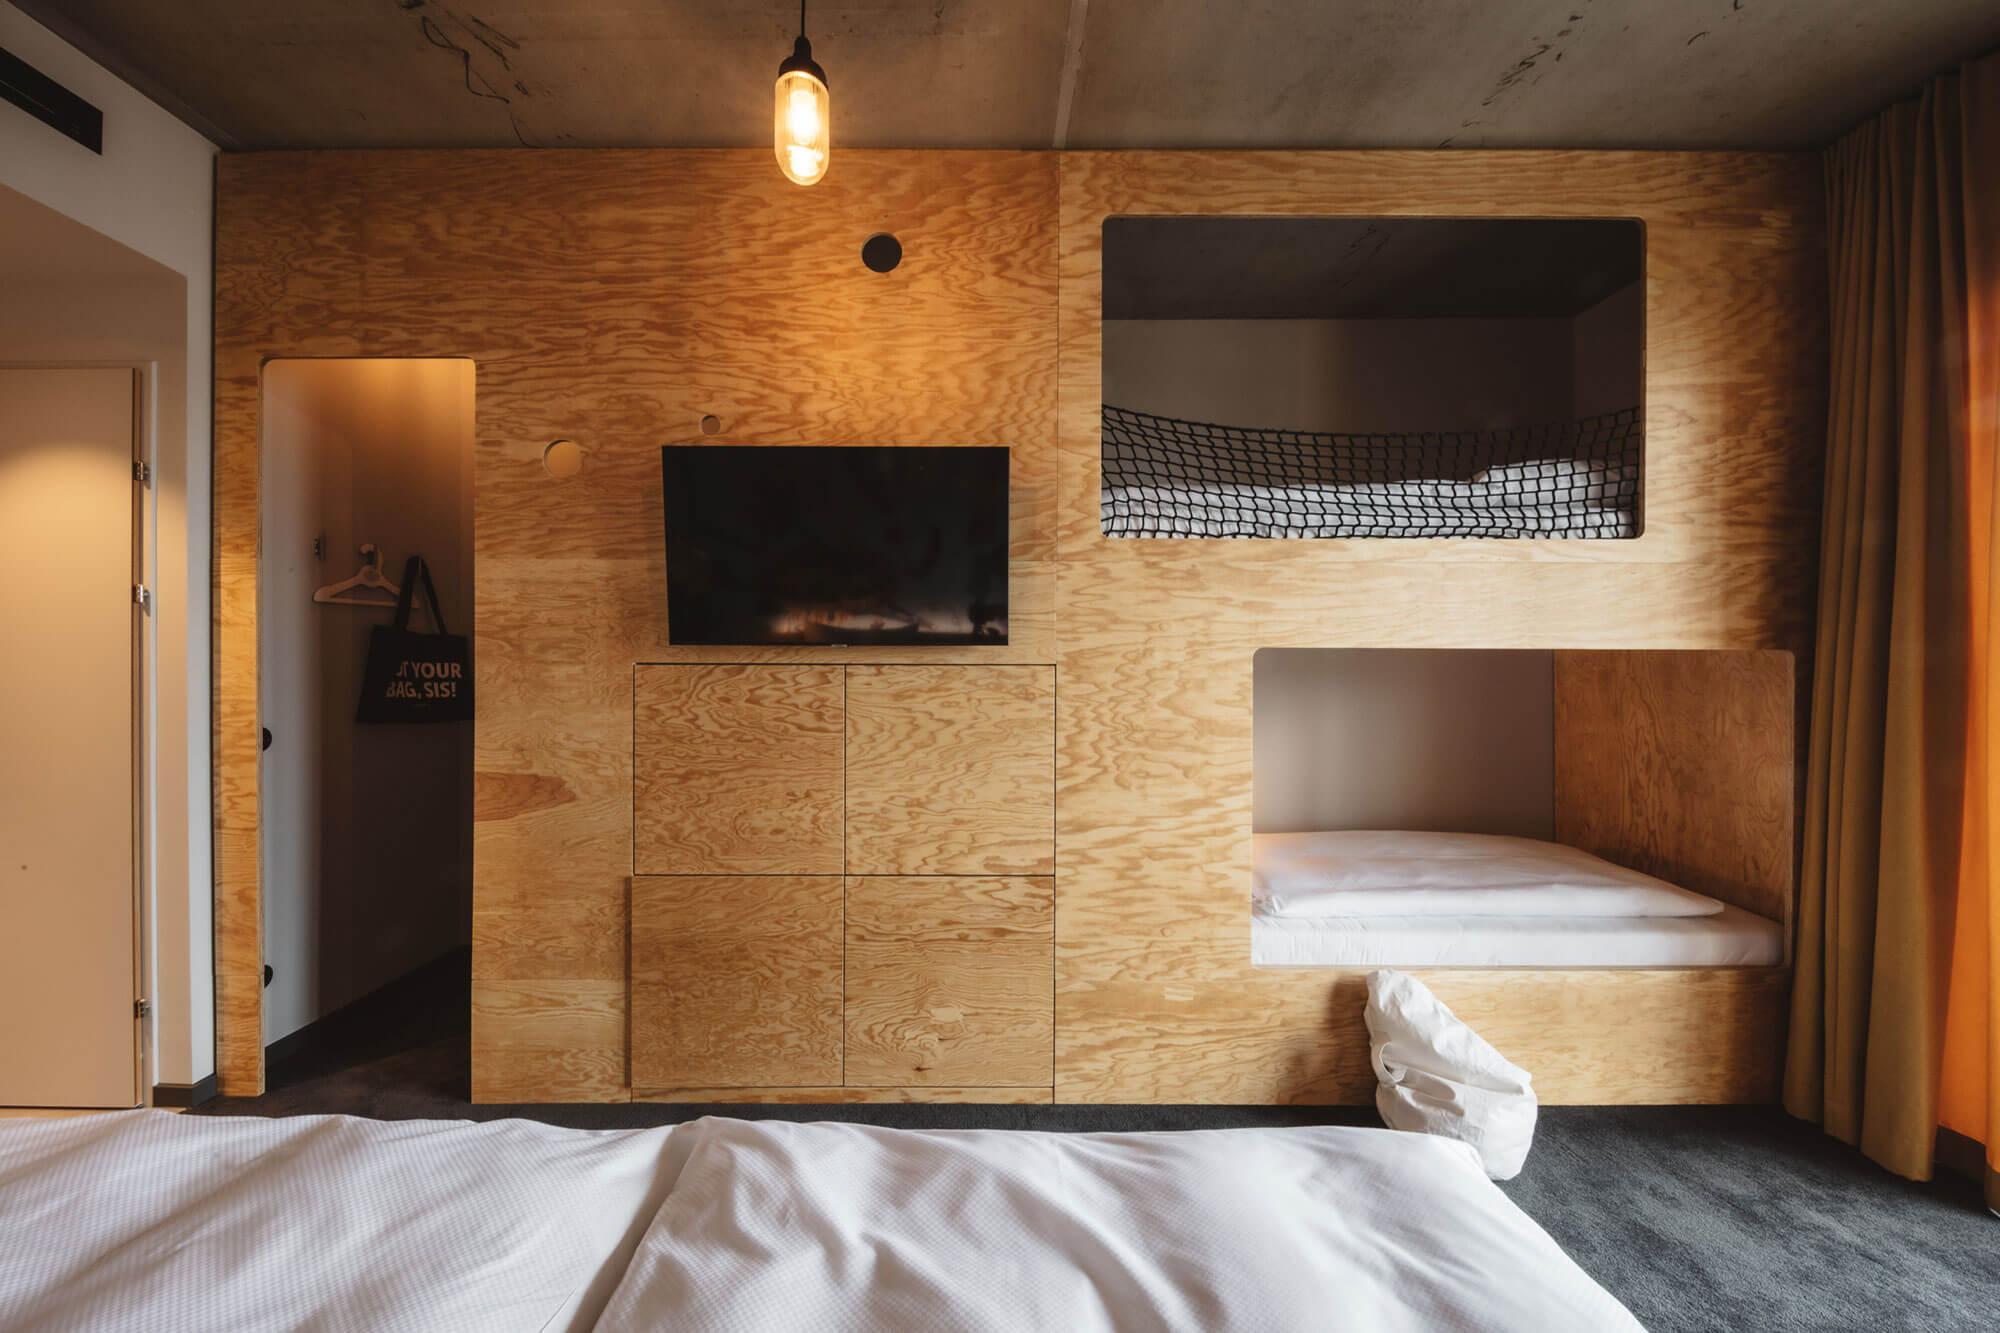 Superbude-Hotel-Hostel-Bachhuber-Hoteleinrichtungen-2